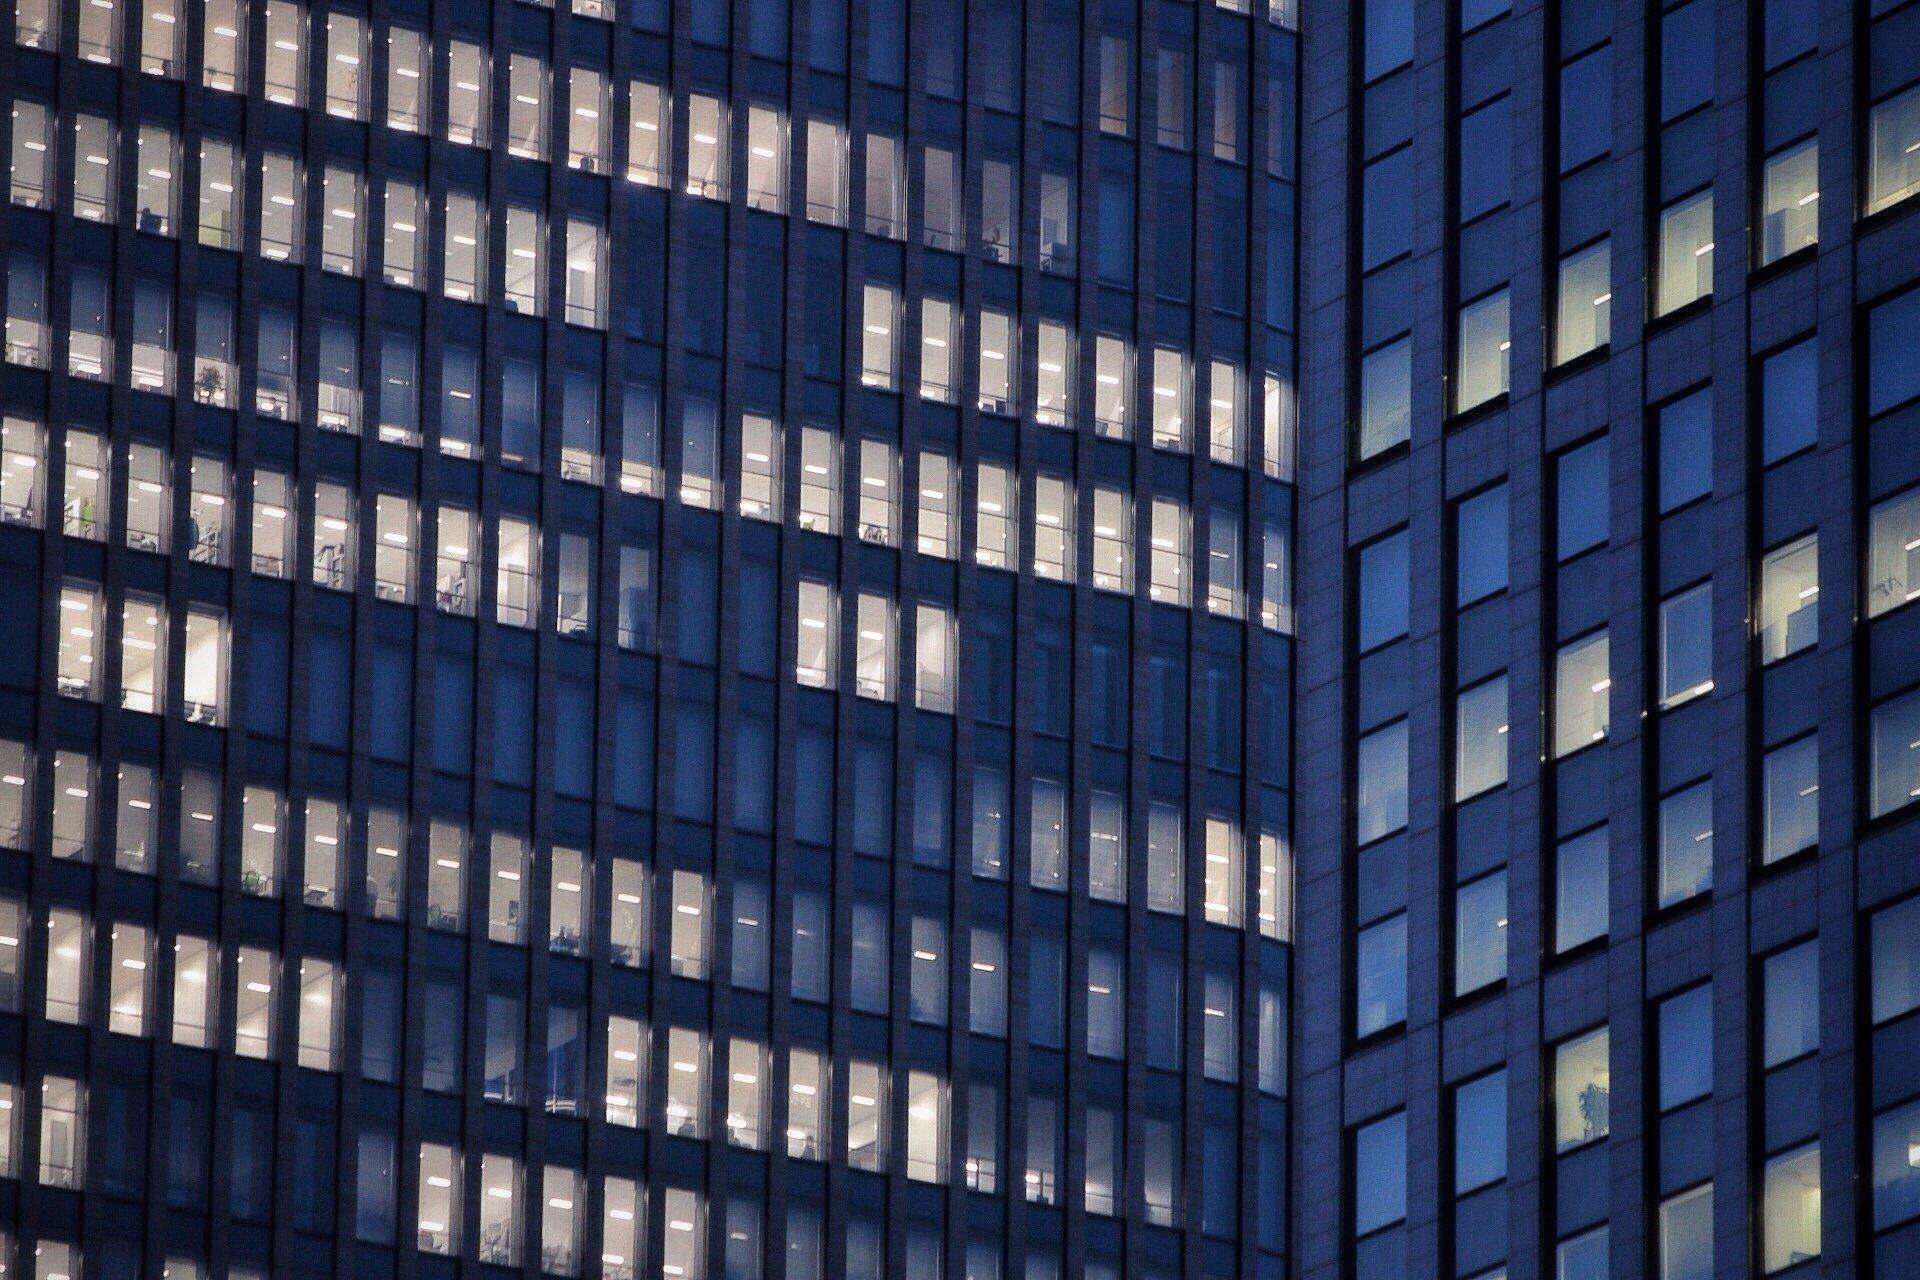 false-perspective-skyscrapper-kasuma-fotografie-blog